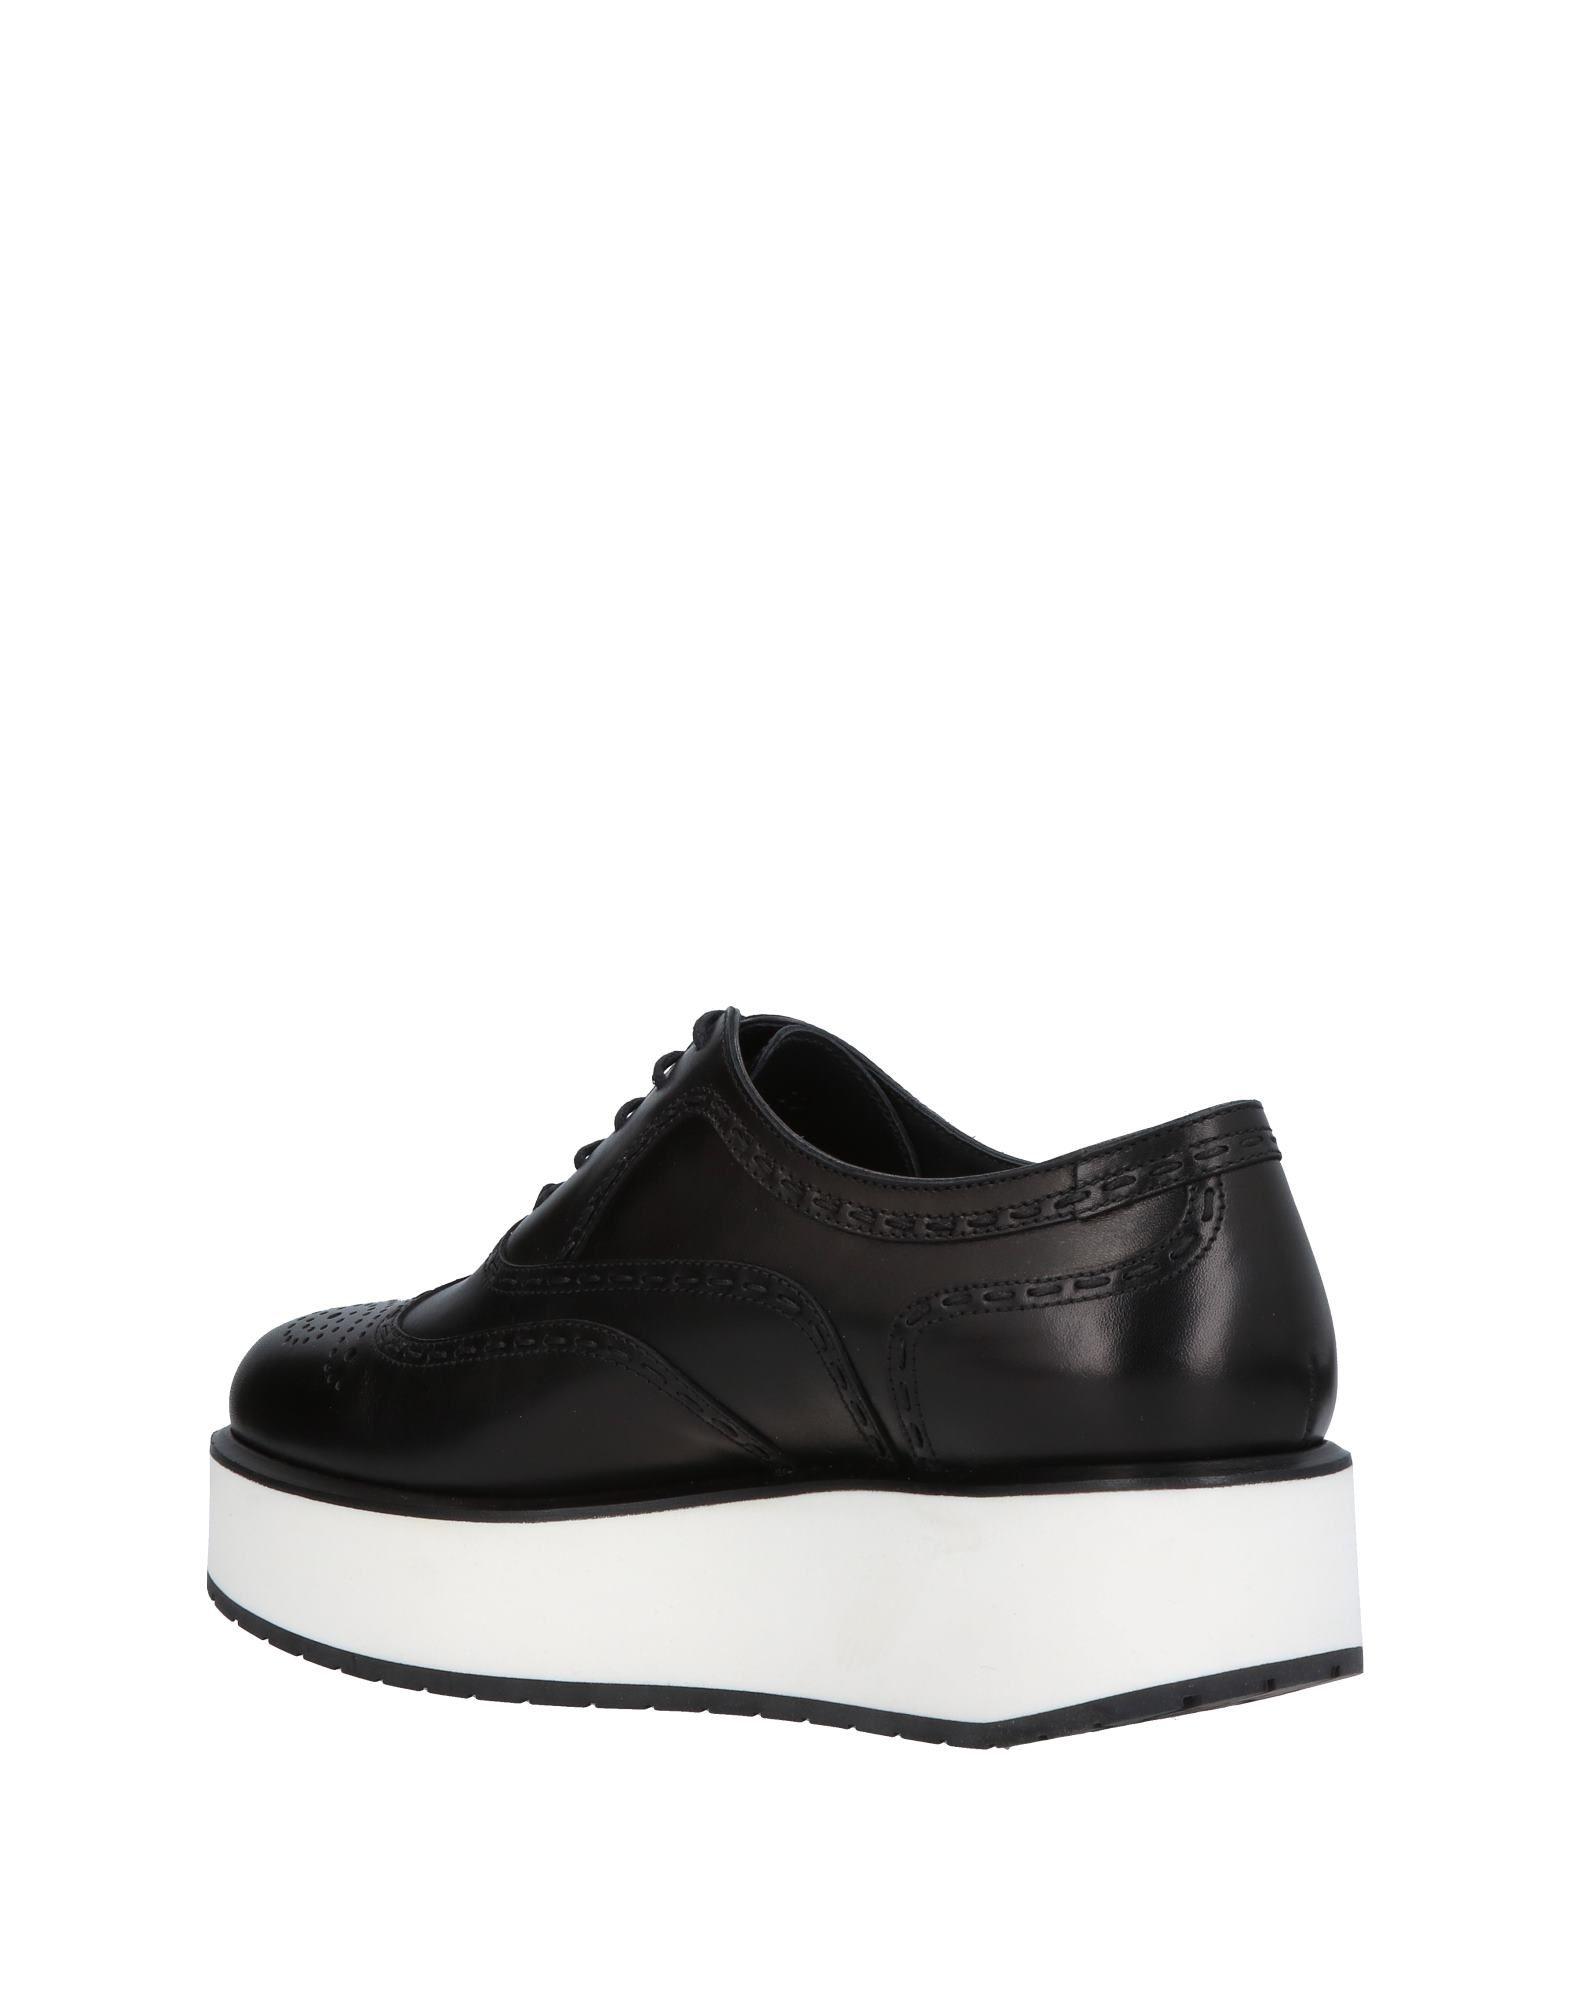 CHAUSSURES - Chaussures à lacetsBottega Veneta f7JEoS